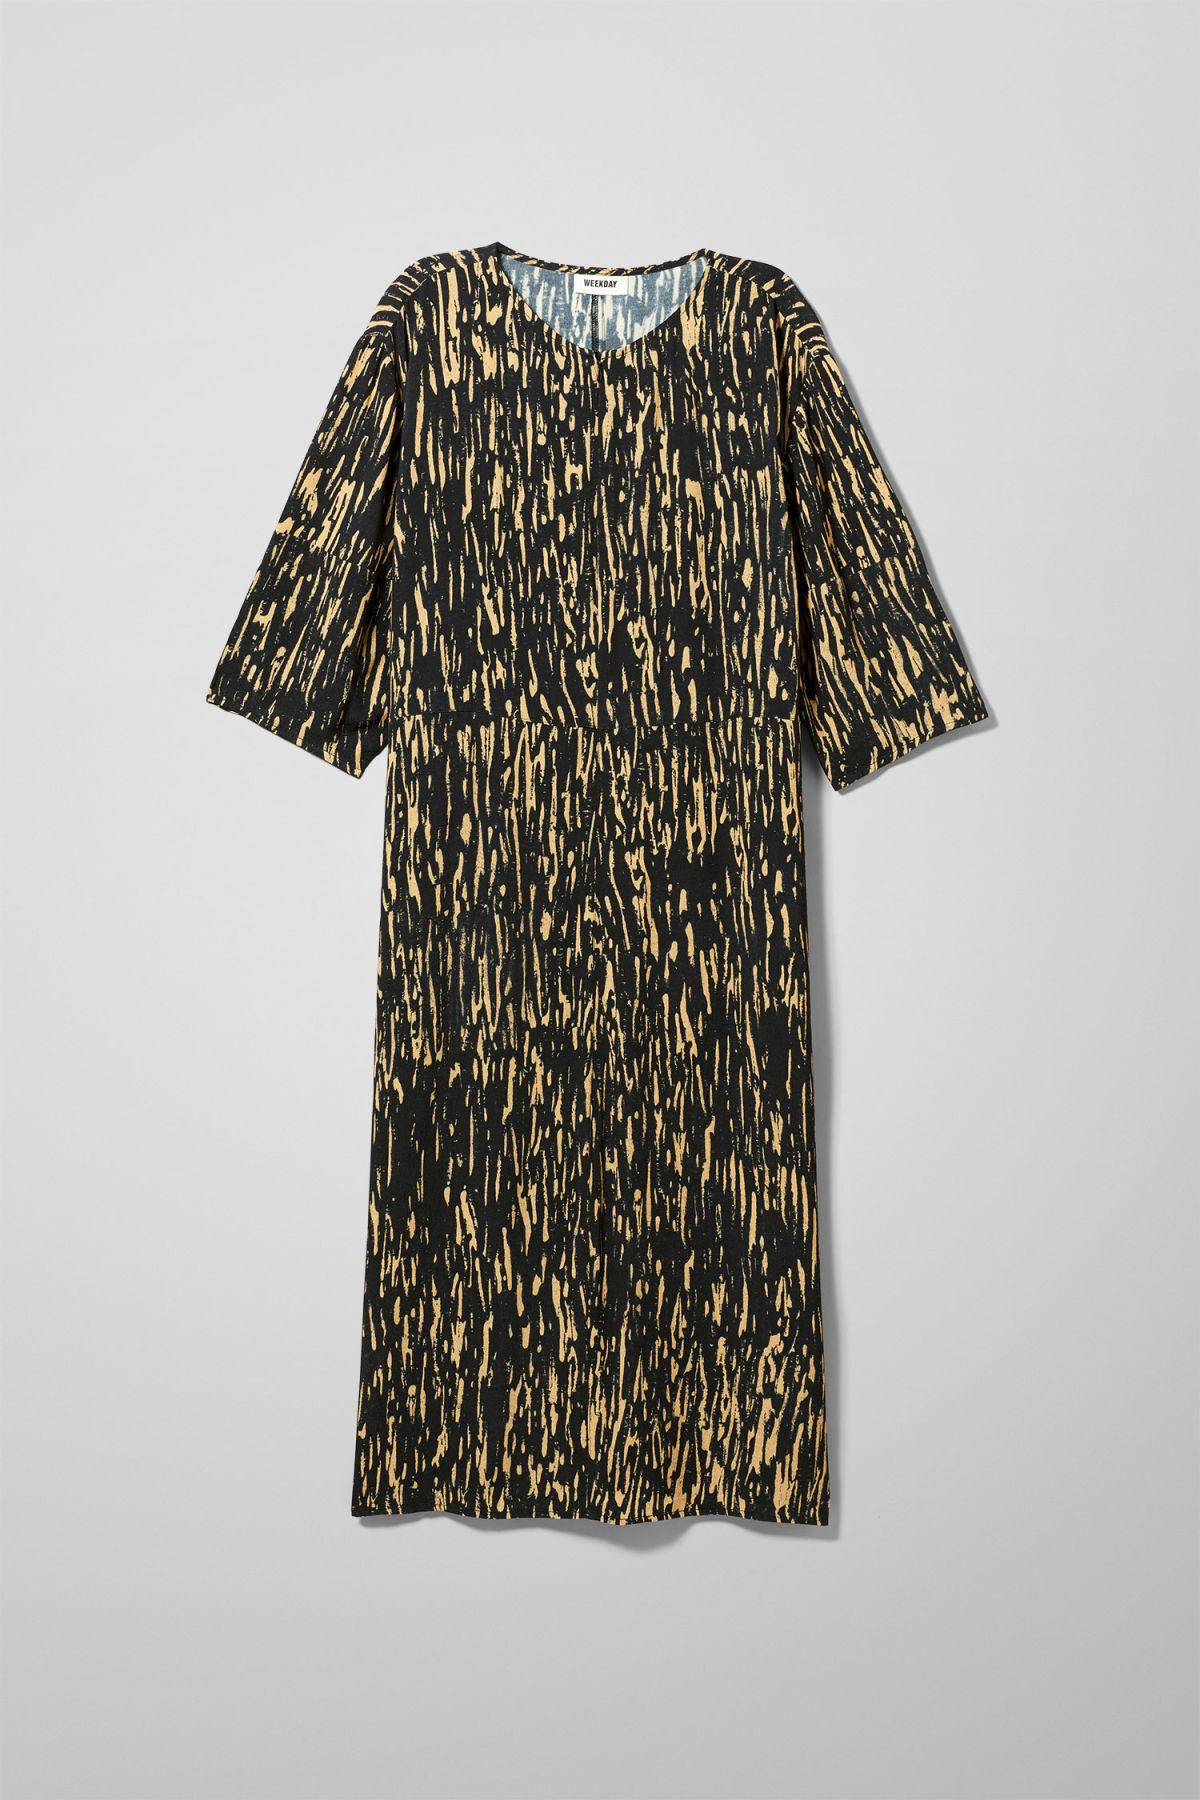 Image of Cara Dress - Black-XS